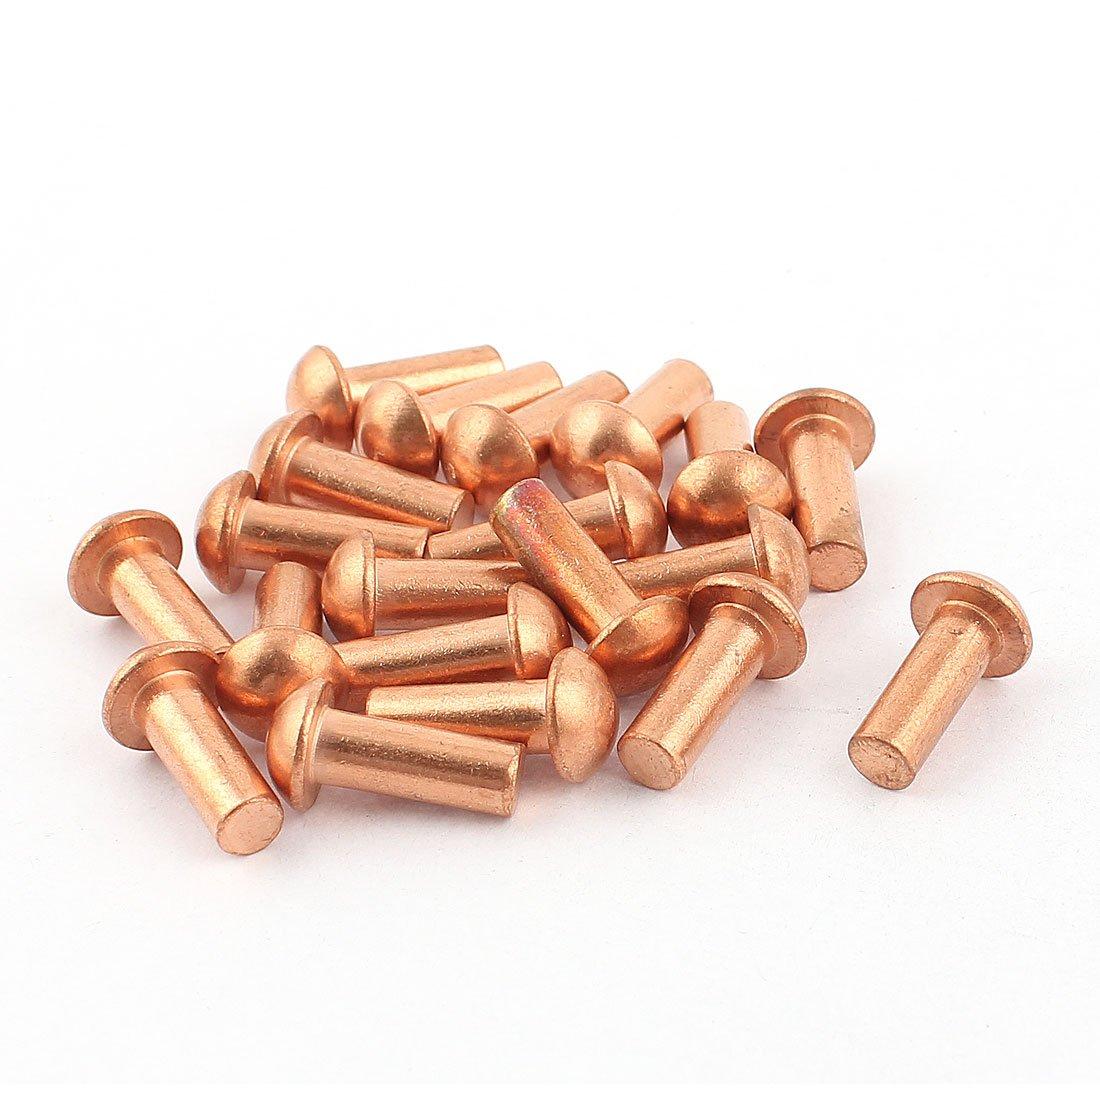 20 Pcs 1/4'' Dia. 5/8'' L Shank Copper Round Head Solid Rivets Fasteners